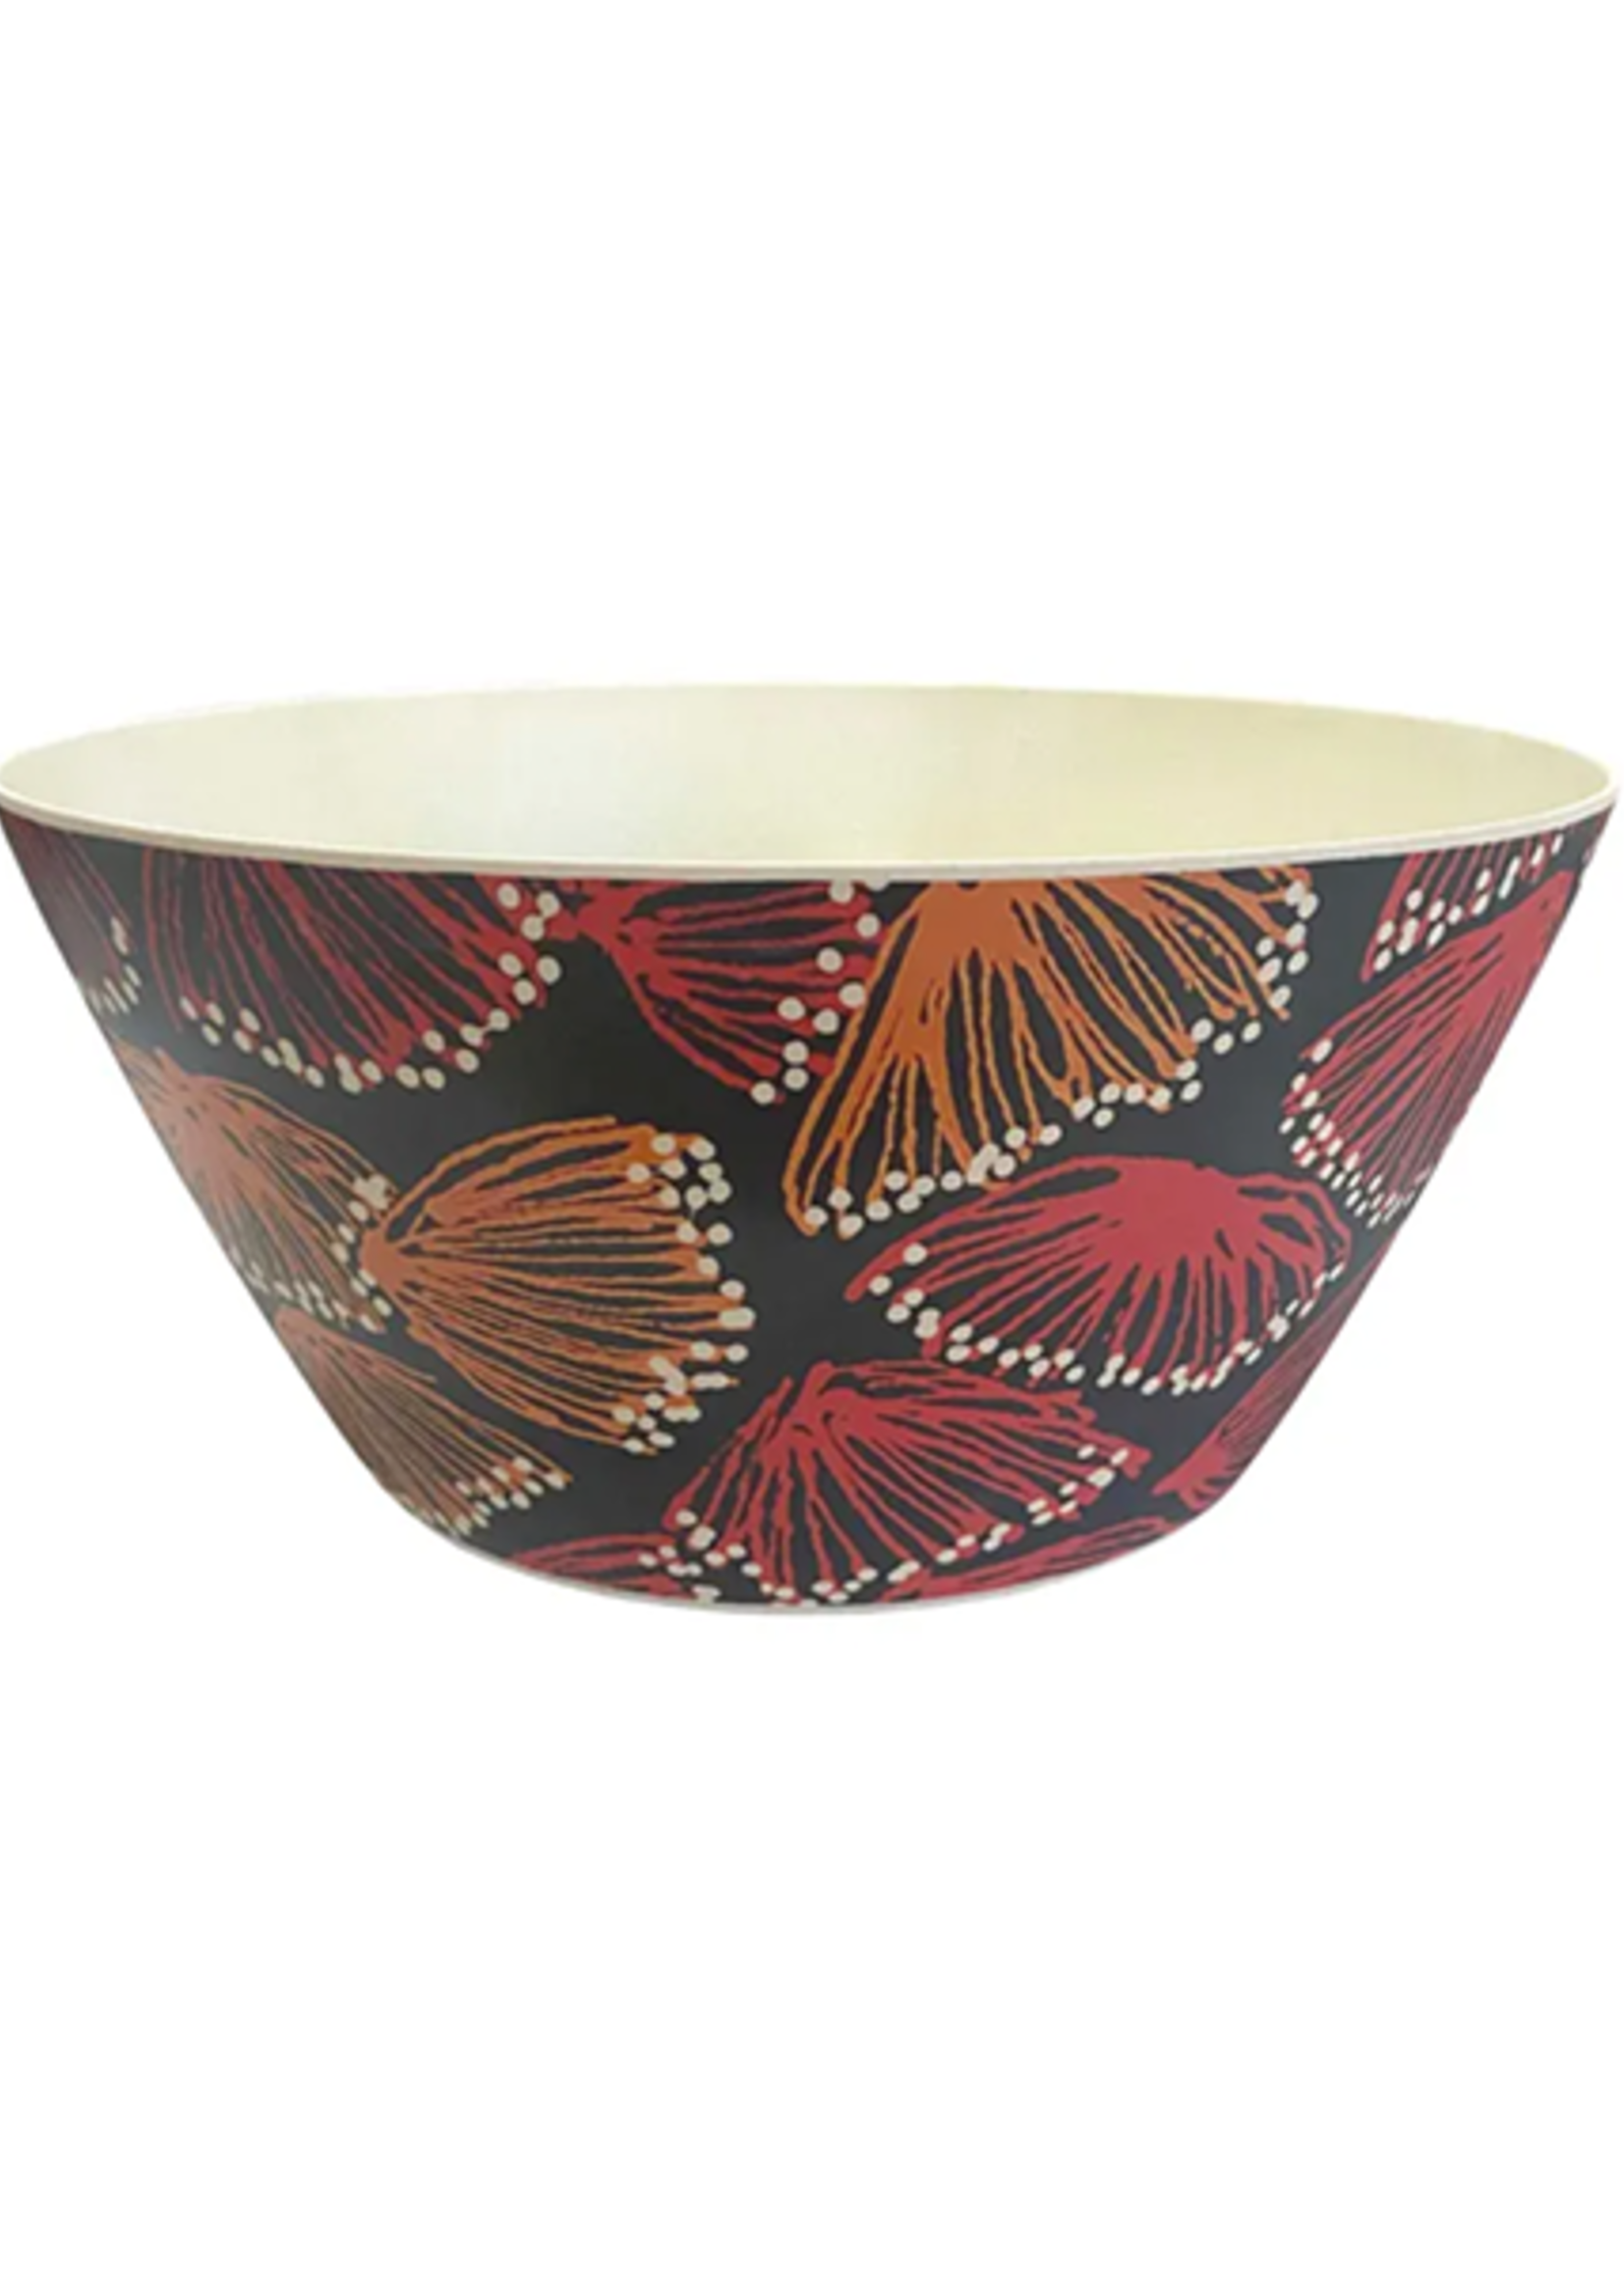 Utopia Bamboo Salad Bowl 214 - Selina Teece